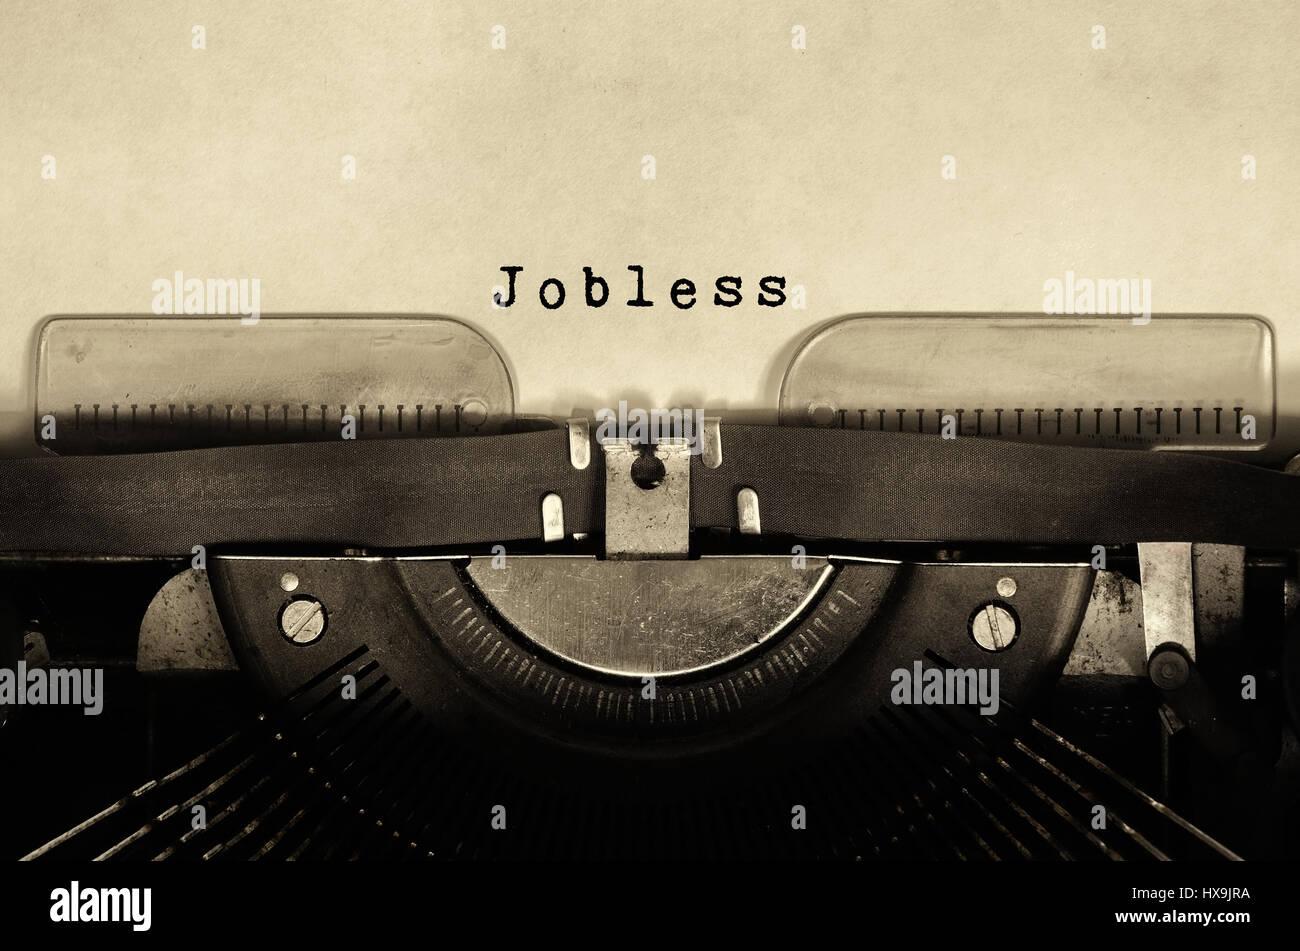 Jobless typed on vintage typewriter - Stock Image